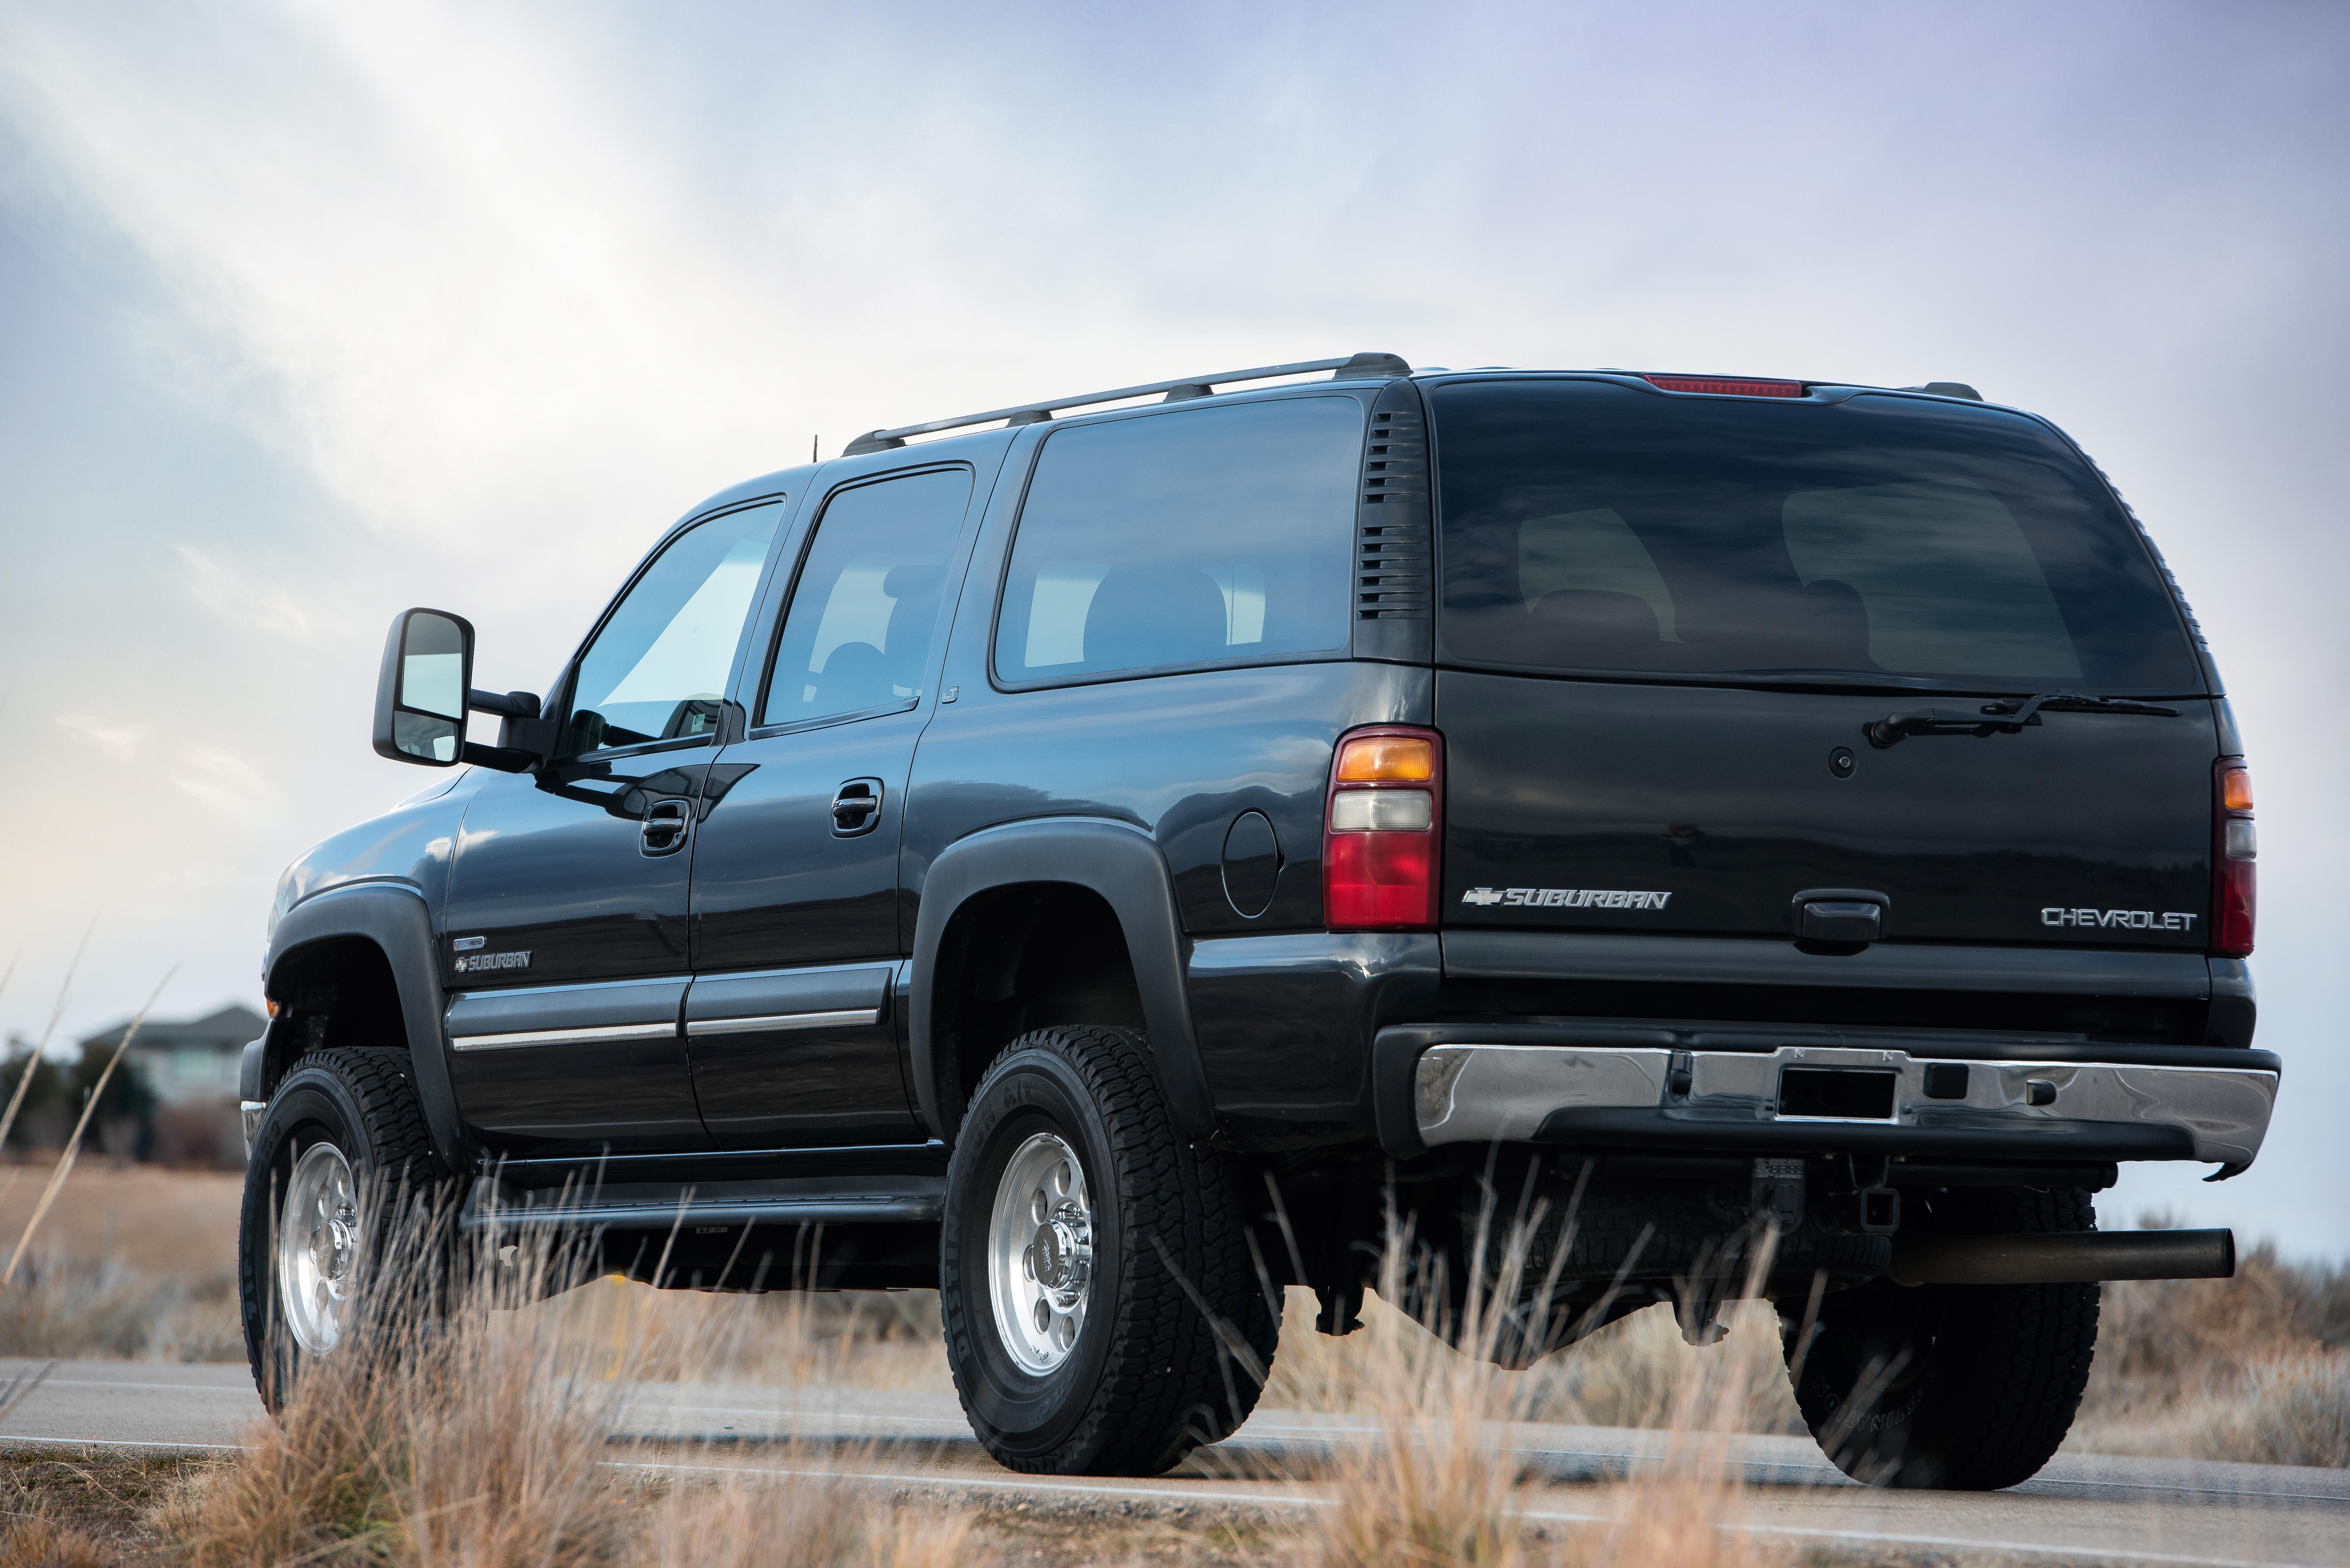 0484 _ 03 Chevy Suburban 2500HD - DRMX _ p60-5